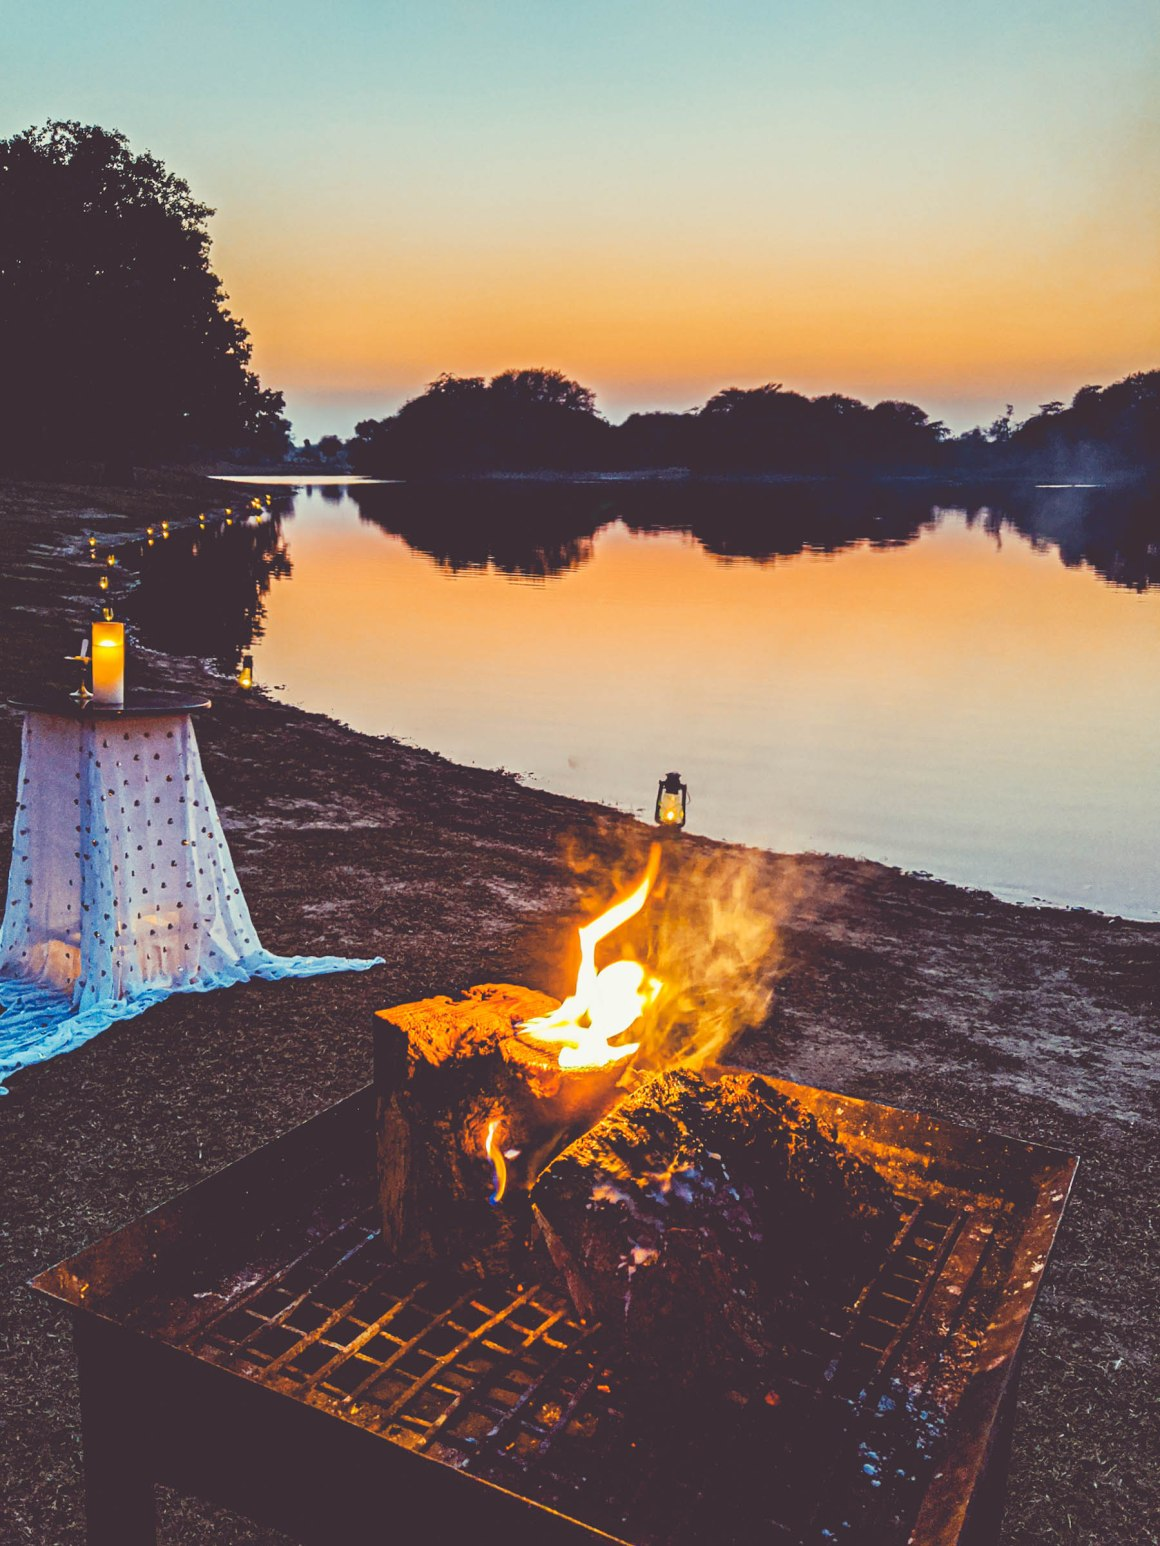 naina.co, naina redhu, narendra bhawan bikaner, siddharth yadav, karan vaid singh, narendra bhawan, bikaner, rajasthan, eyesforrajasthan, new year eve, new years, new year 2020, 40and10in2020, home, heart, hearth, friendship, friends, bharat, travel, eyesfordestinations, india, eyesforindia, vacation, year end, travel photographer, travel blogger, india room, indian hotel, bikaner hotel, exceptional hospitality, turning 40